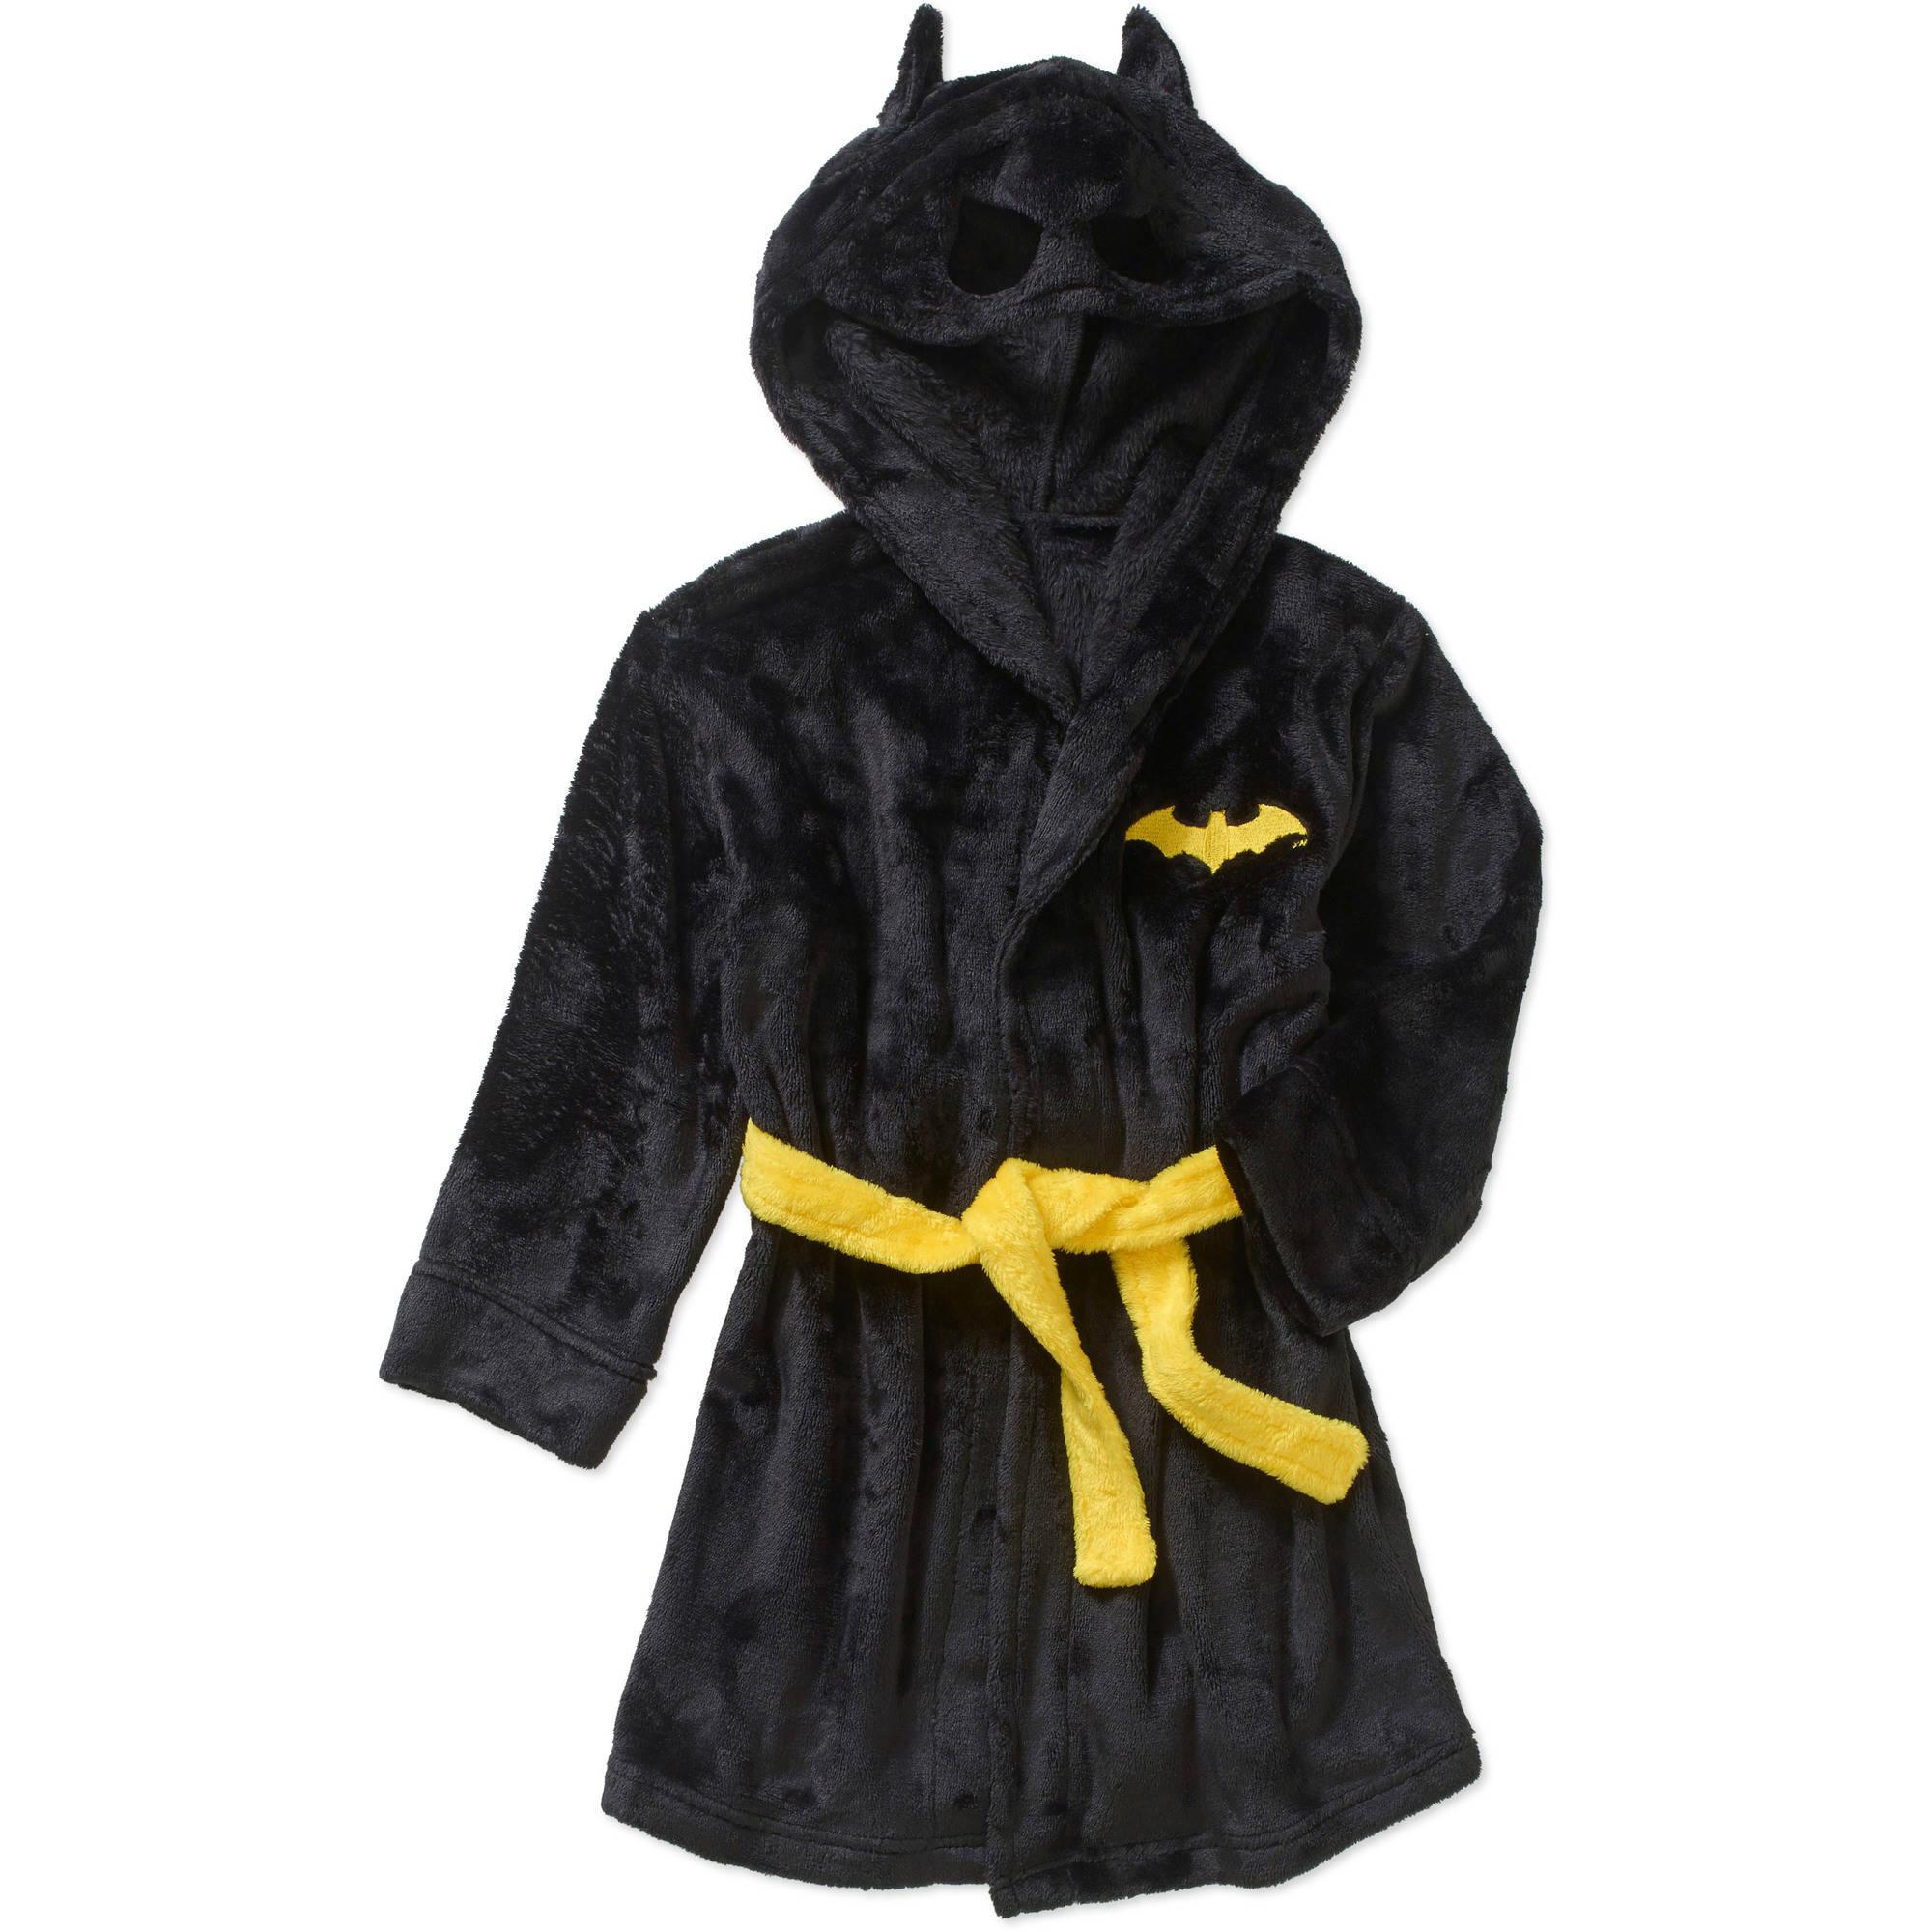 Batman Toddler Boy Hooded Robe